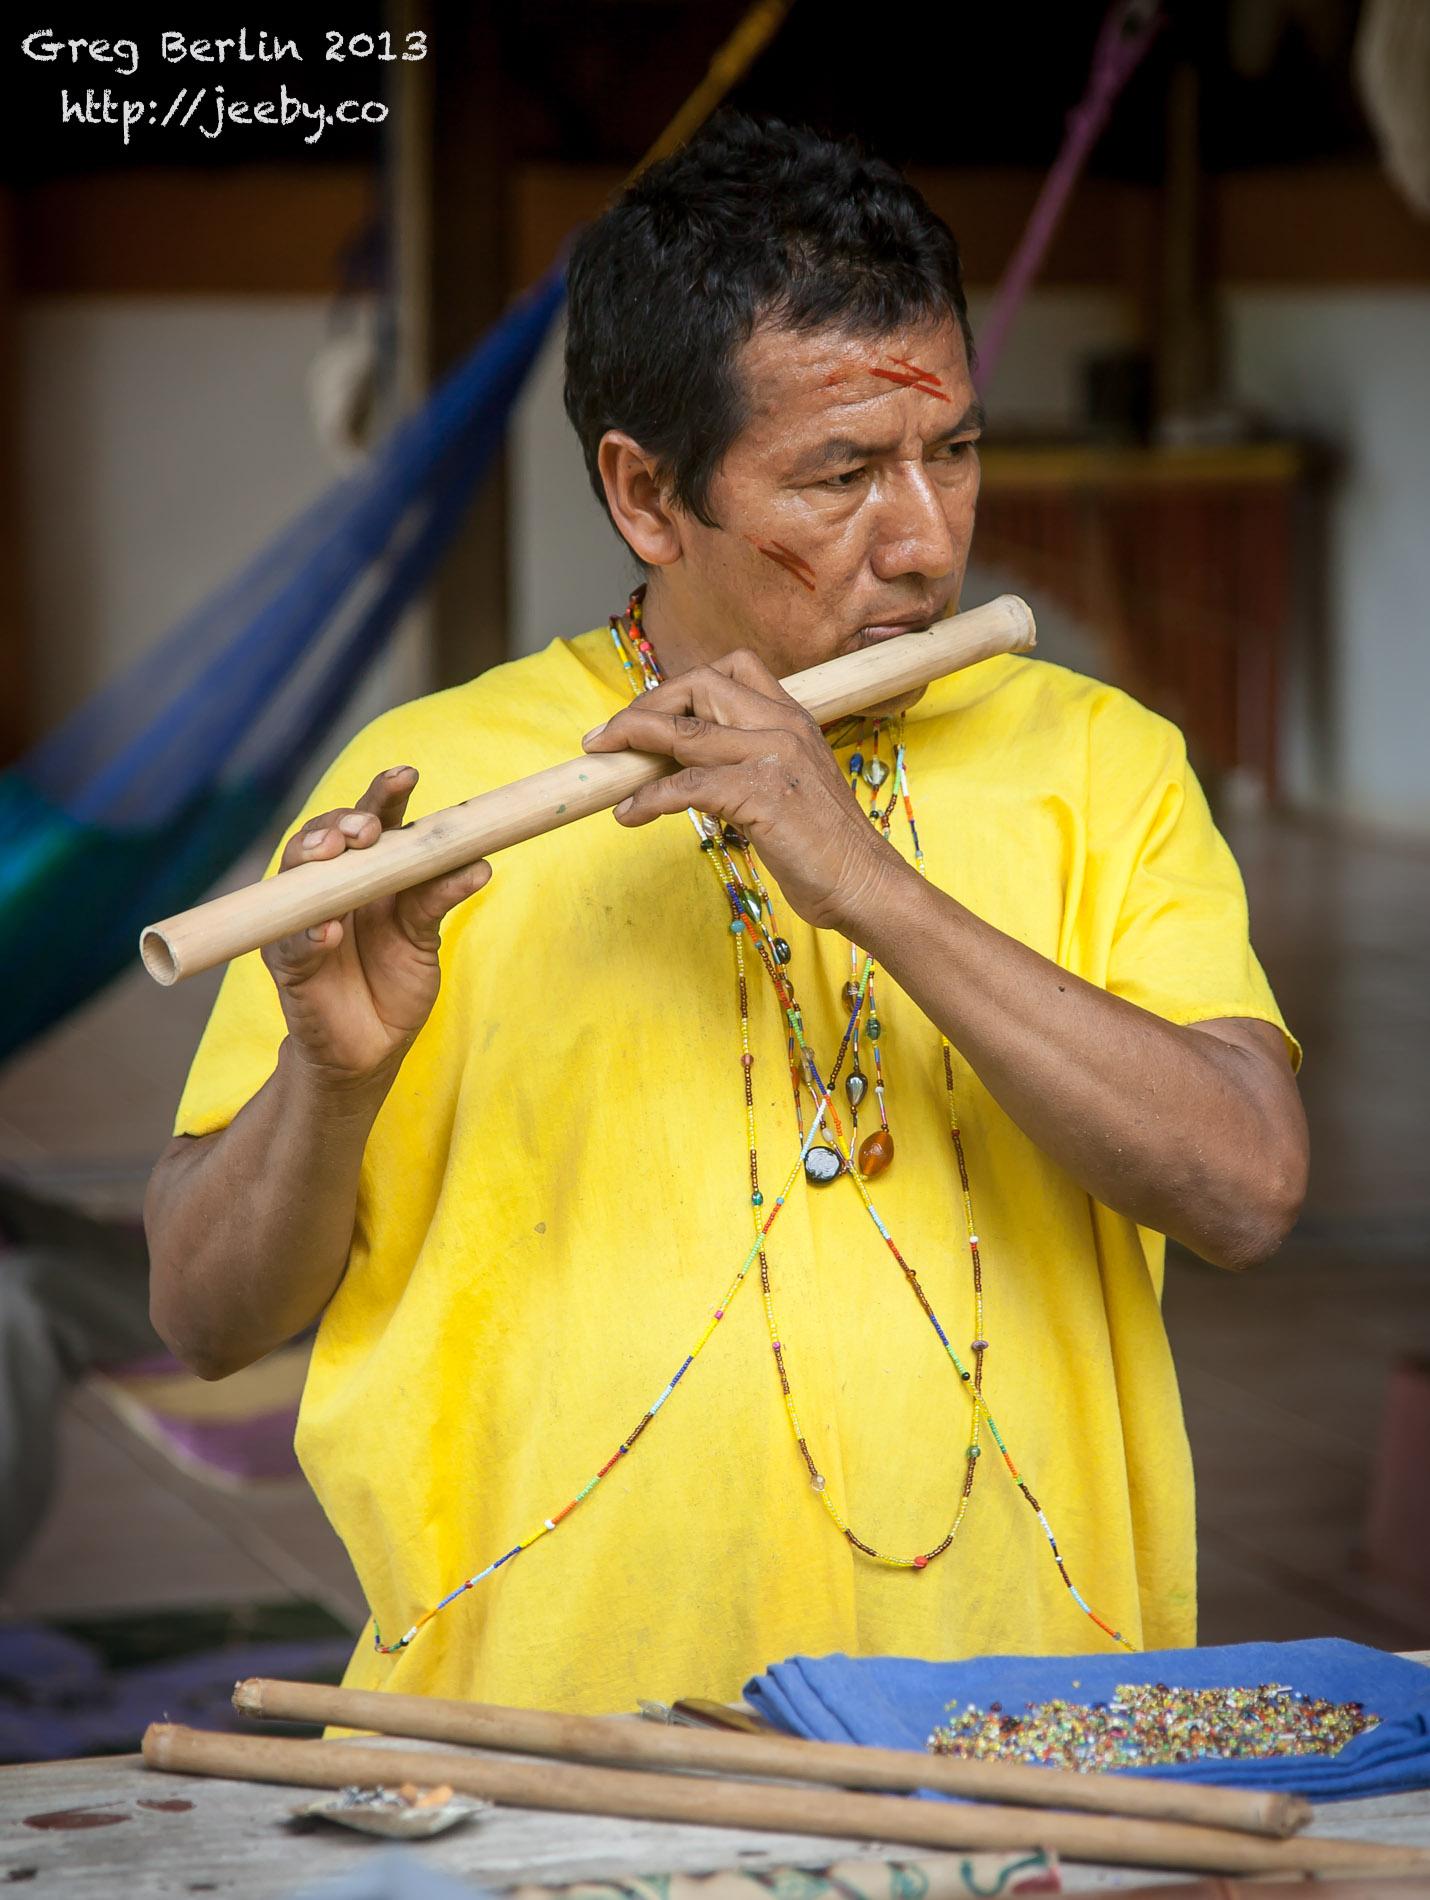 Seikopai-Elder-with-Flute